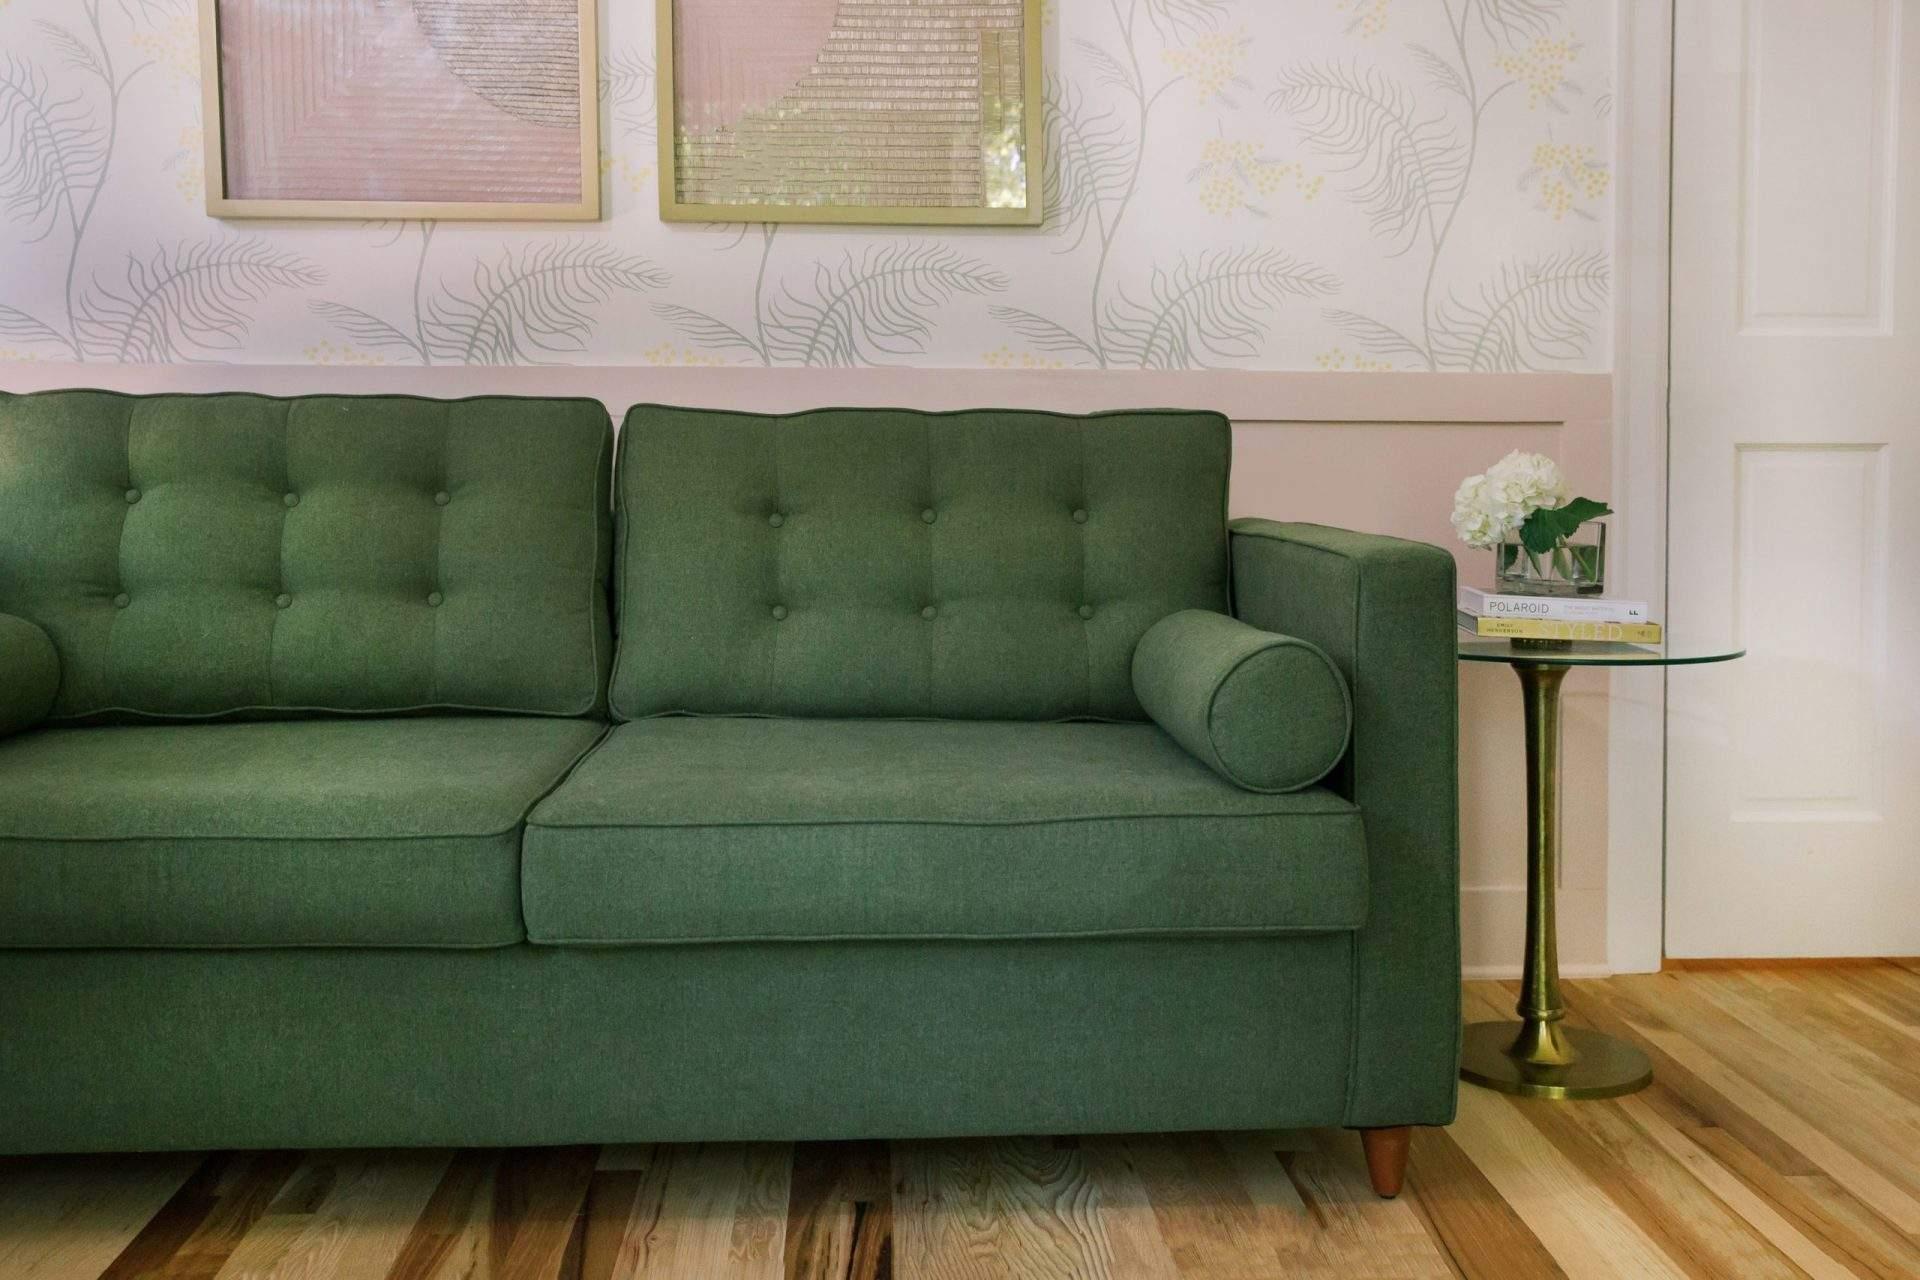 etch design group interior design austin texas galante (59)